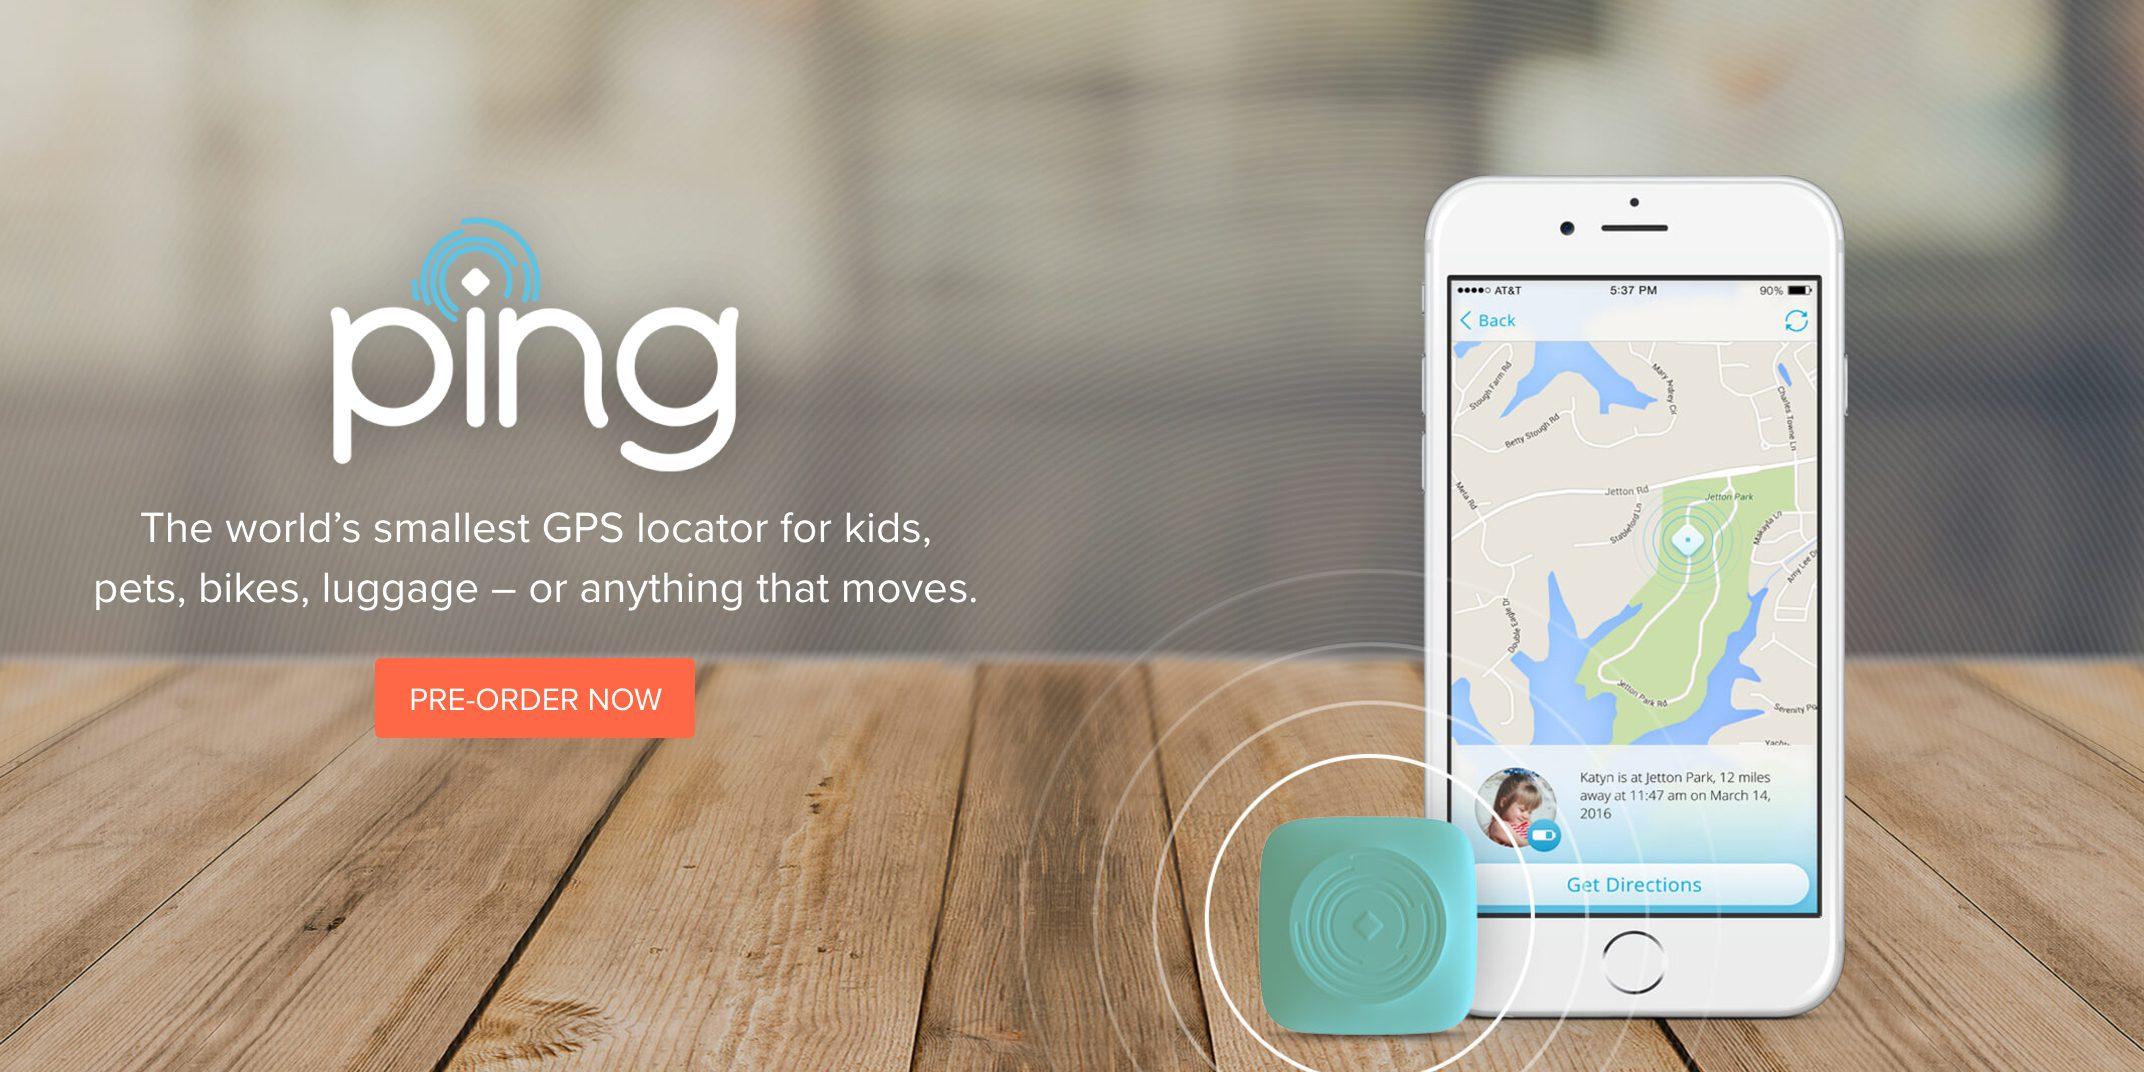 ping-gps-tracker